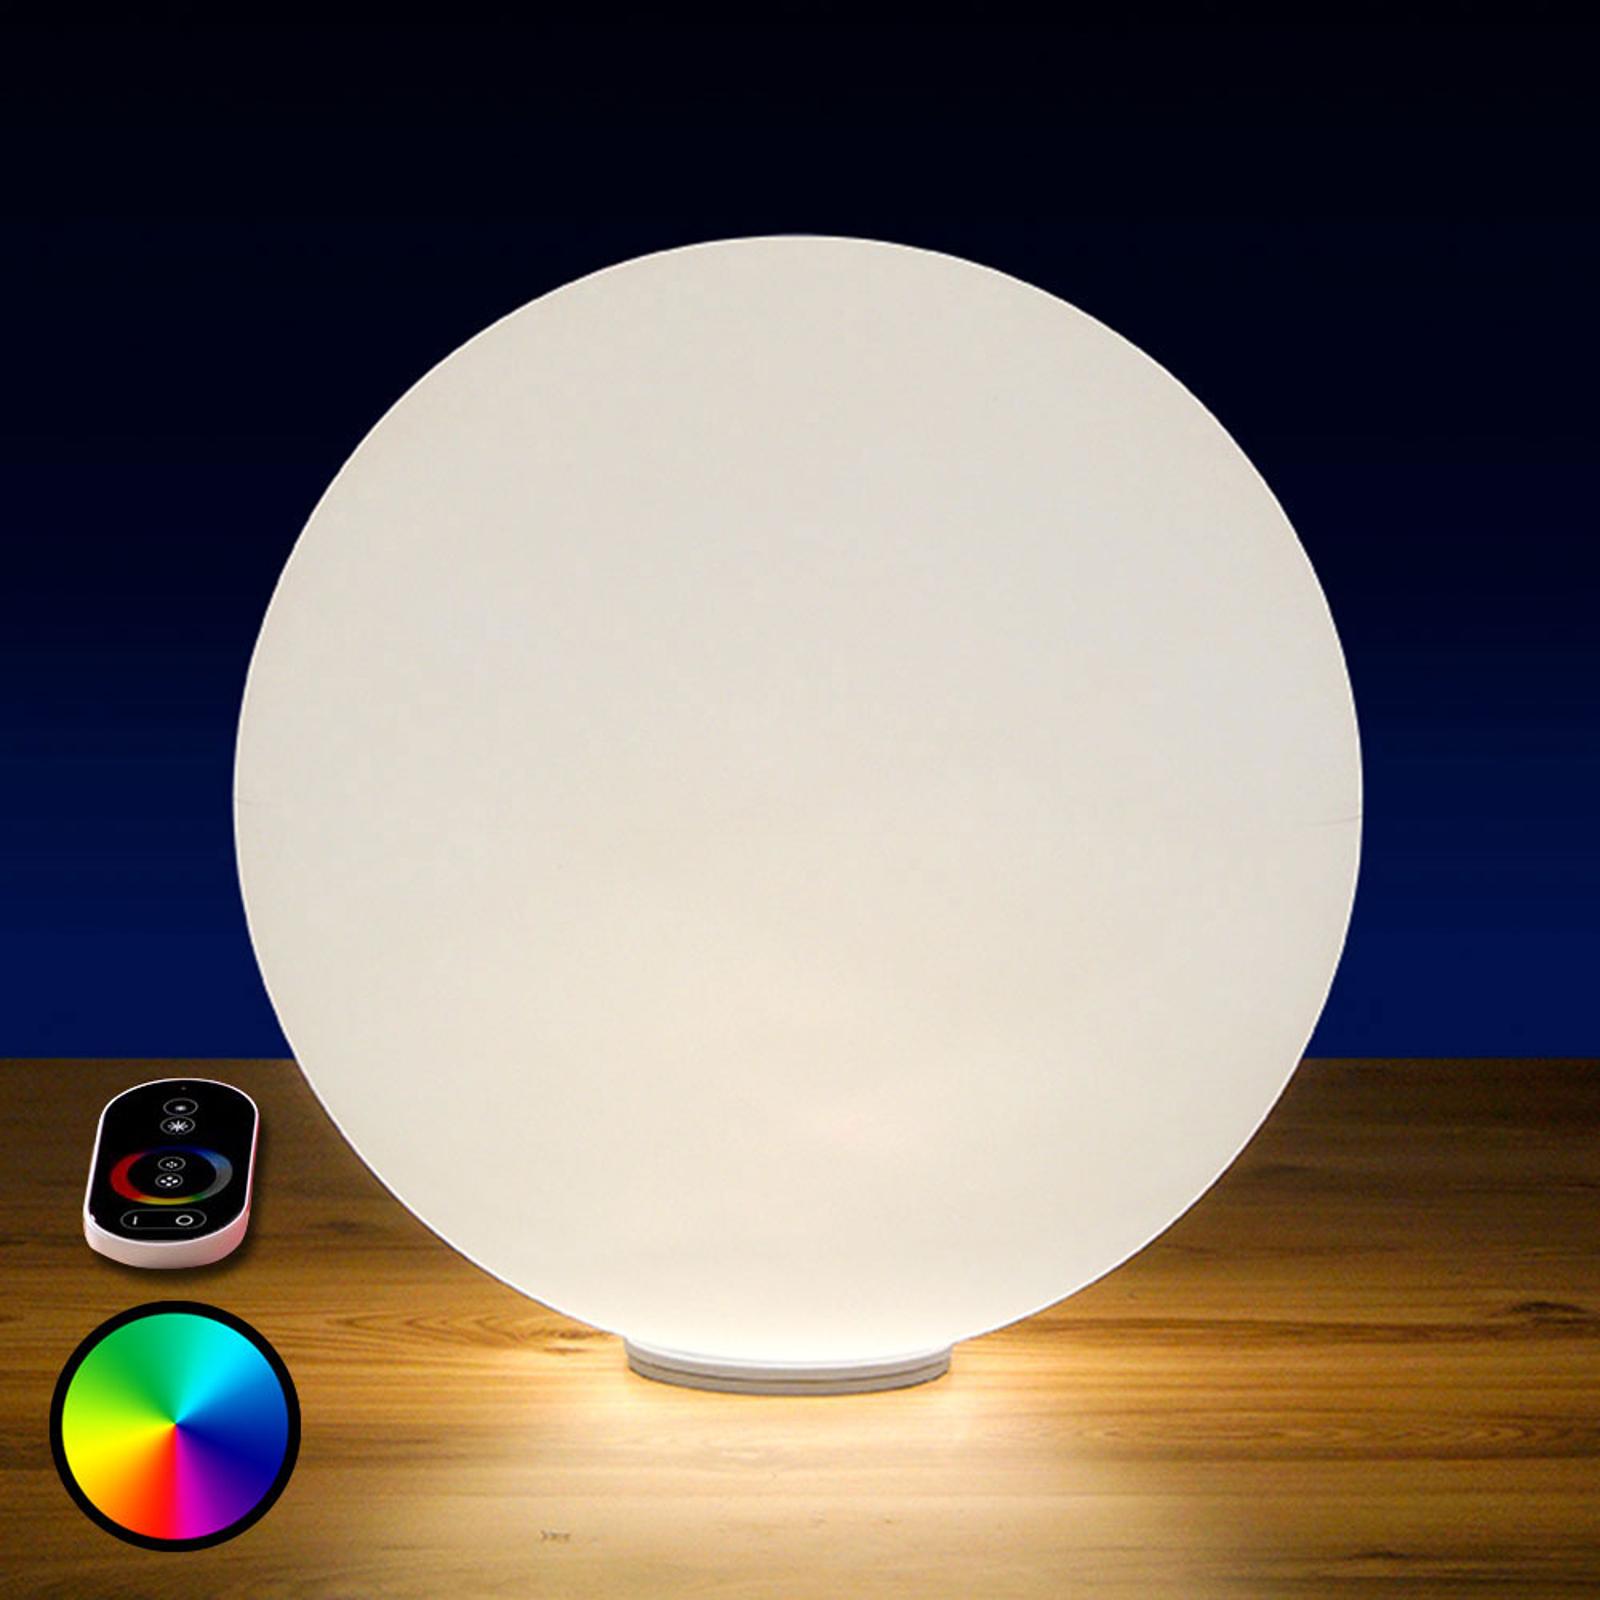 Kula LED RGB Snowball na zewnątrz akumulator 30 cm